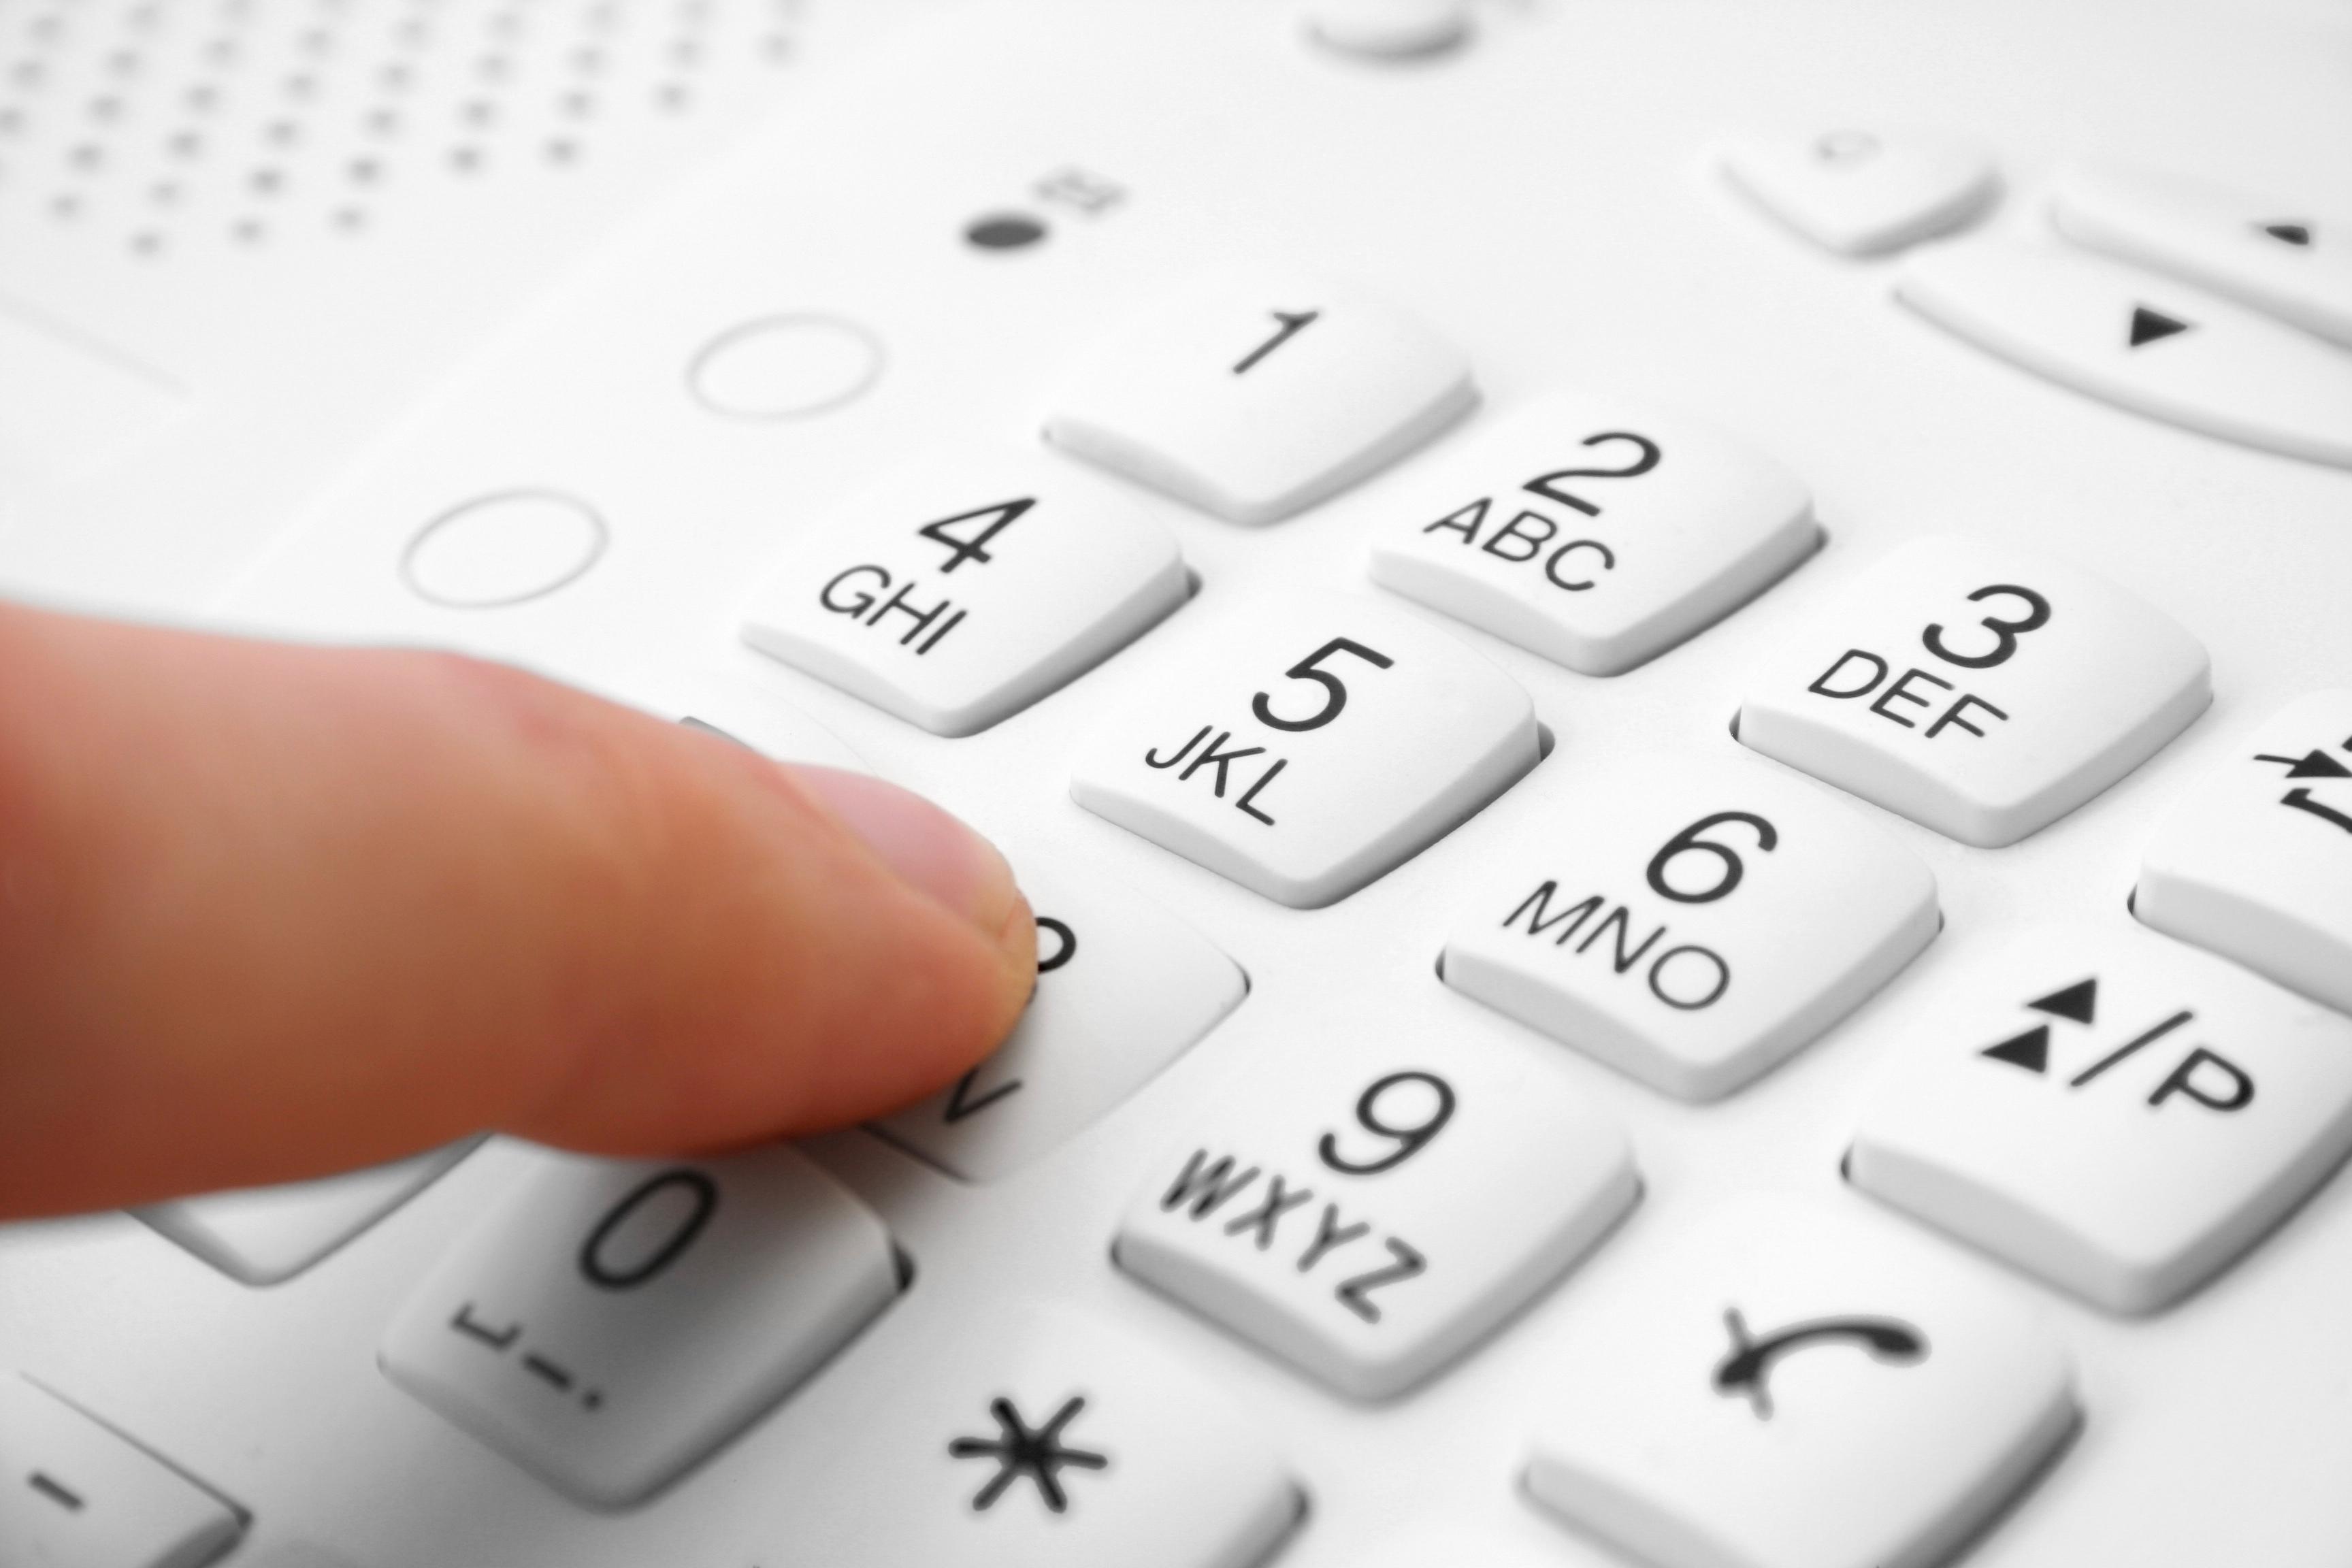 Finger auf Telefon-Tastatur